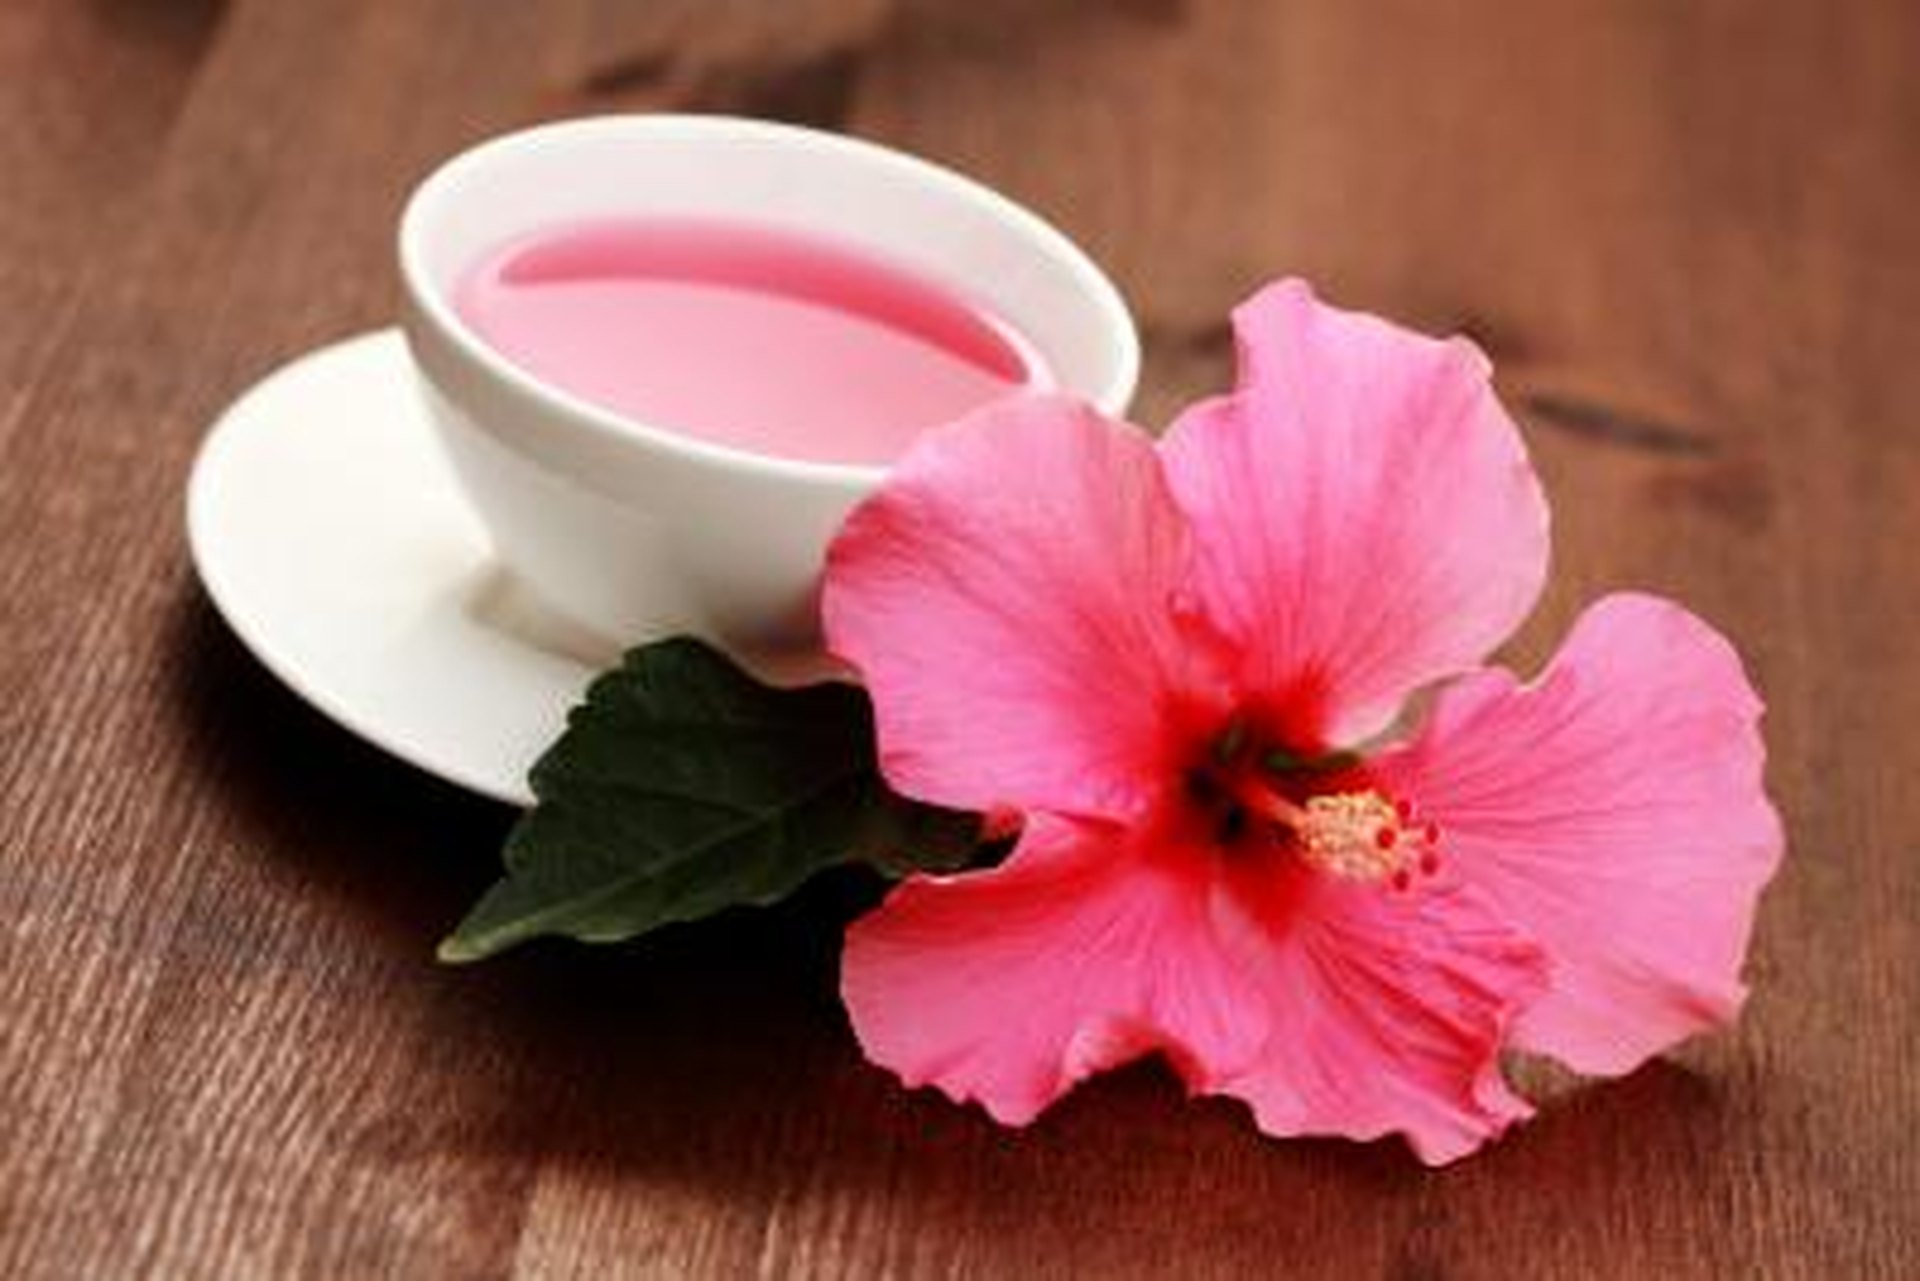 Hibiscus tea and caffeine livestrong izmirmasajfo